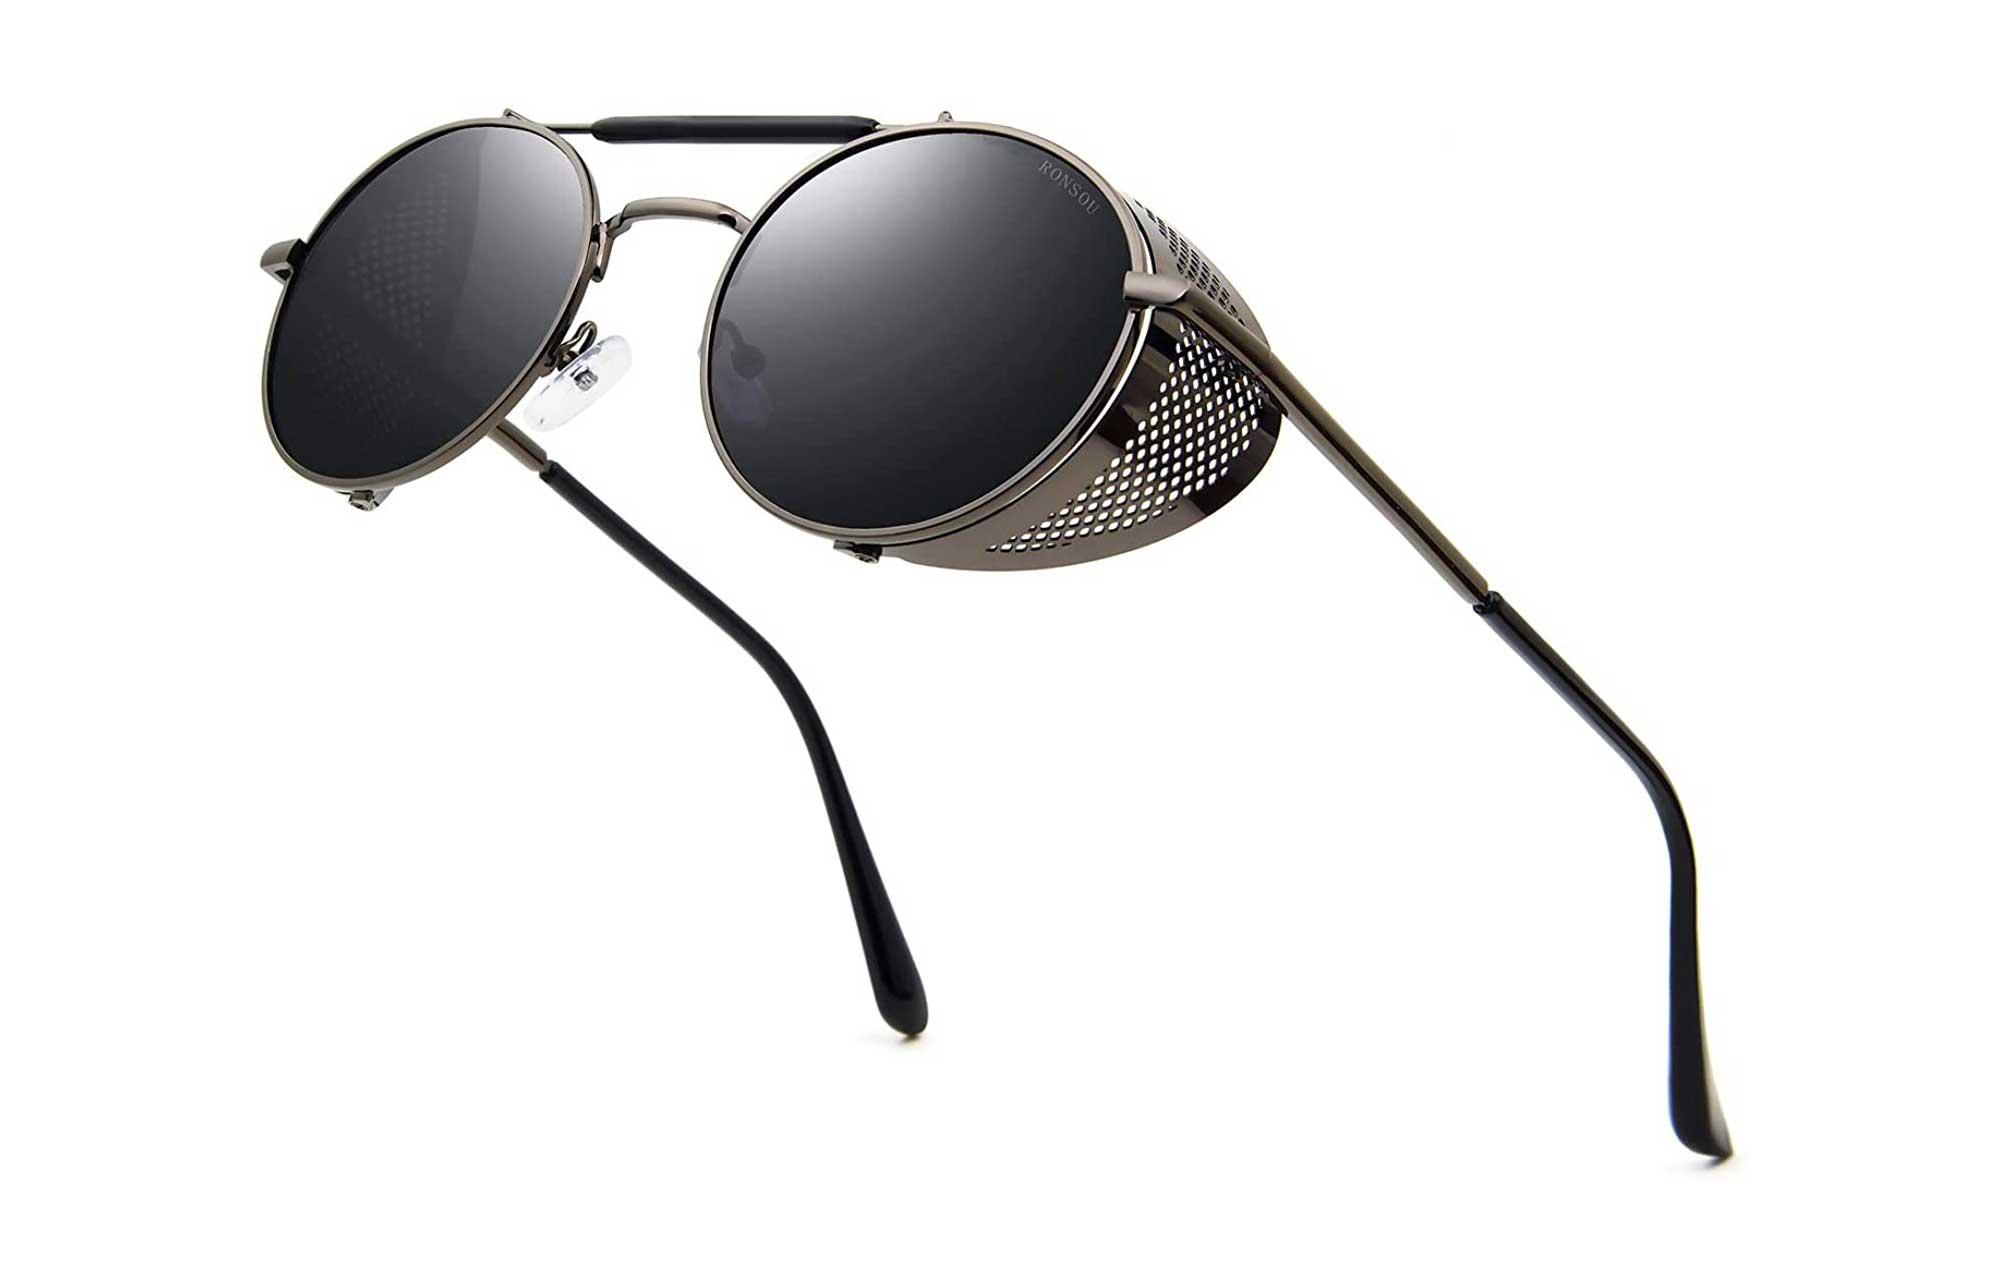 Ronsou Steampunk Style Round Vintage Polarized Sunglasses Retro Eyewear